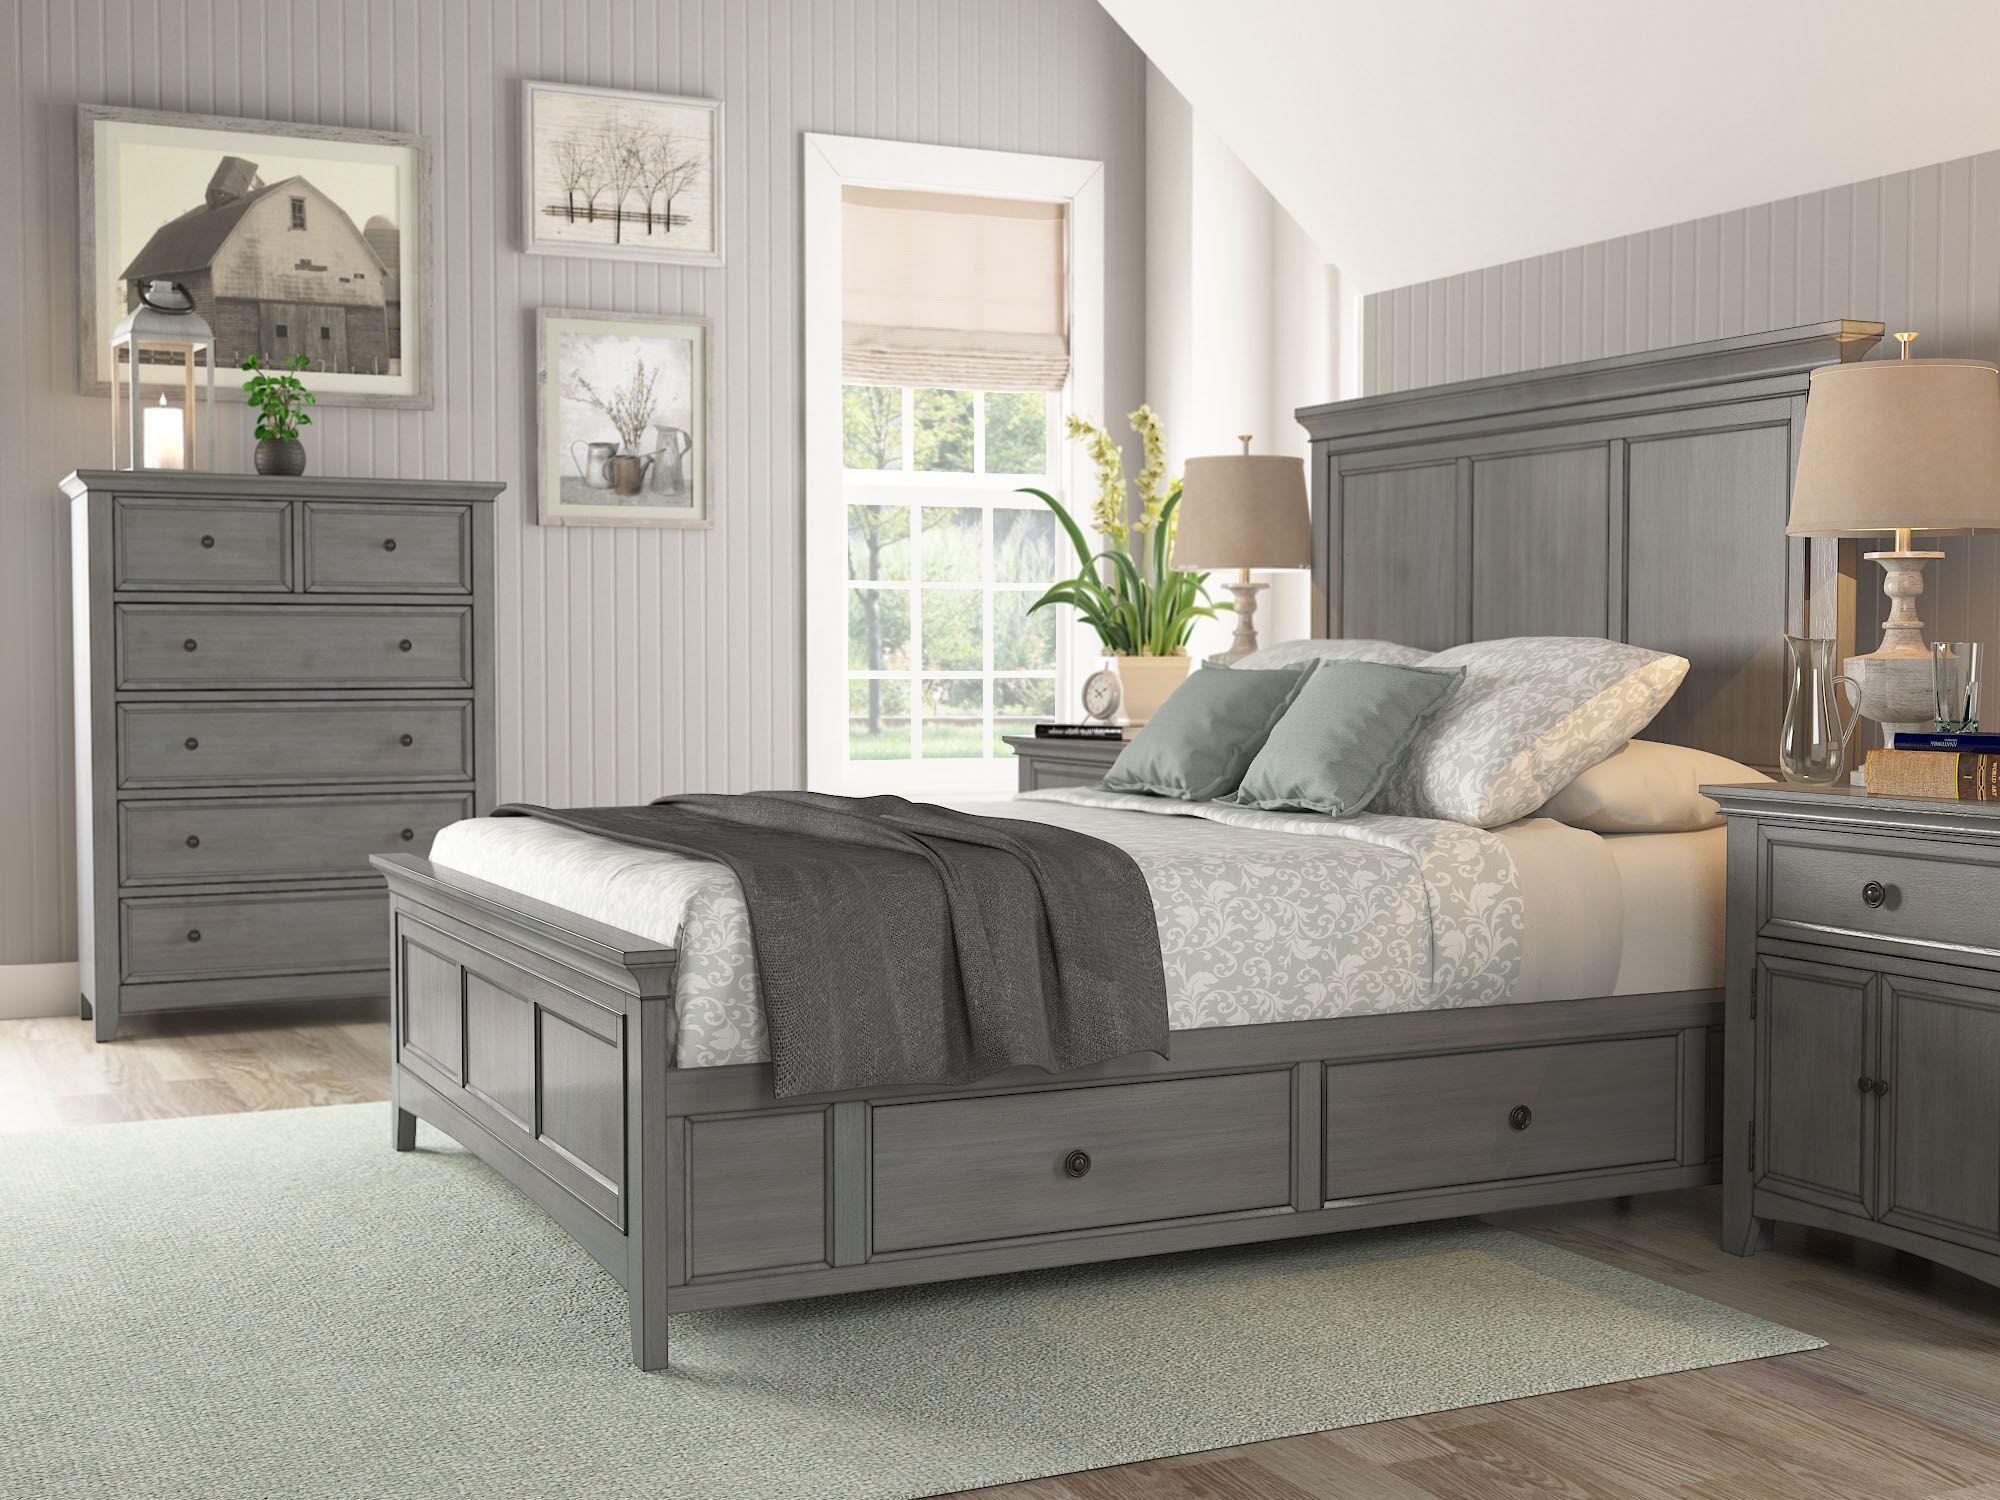 Sefton Storage Platform Bed Color: Antique Gray, Size: Queen